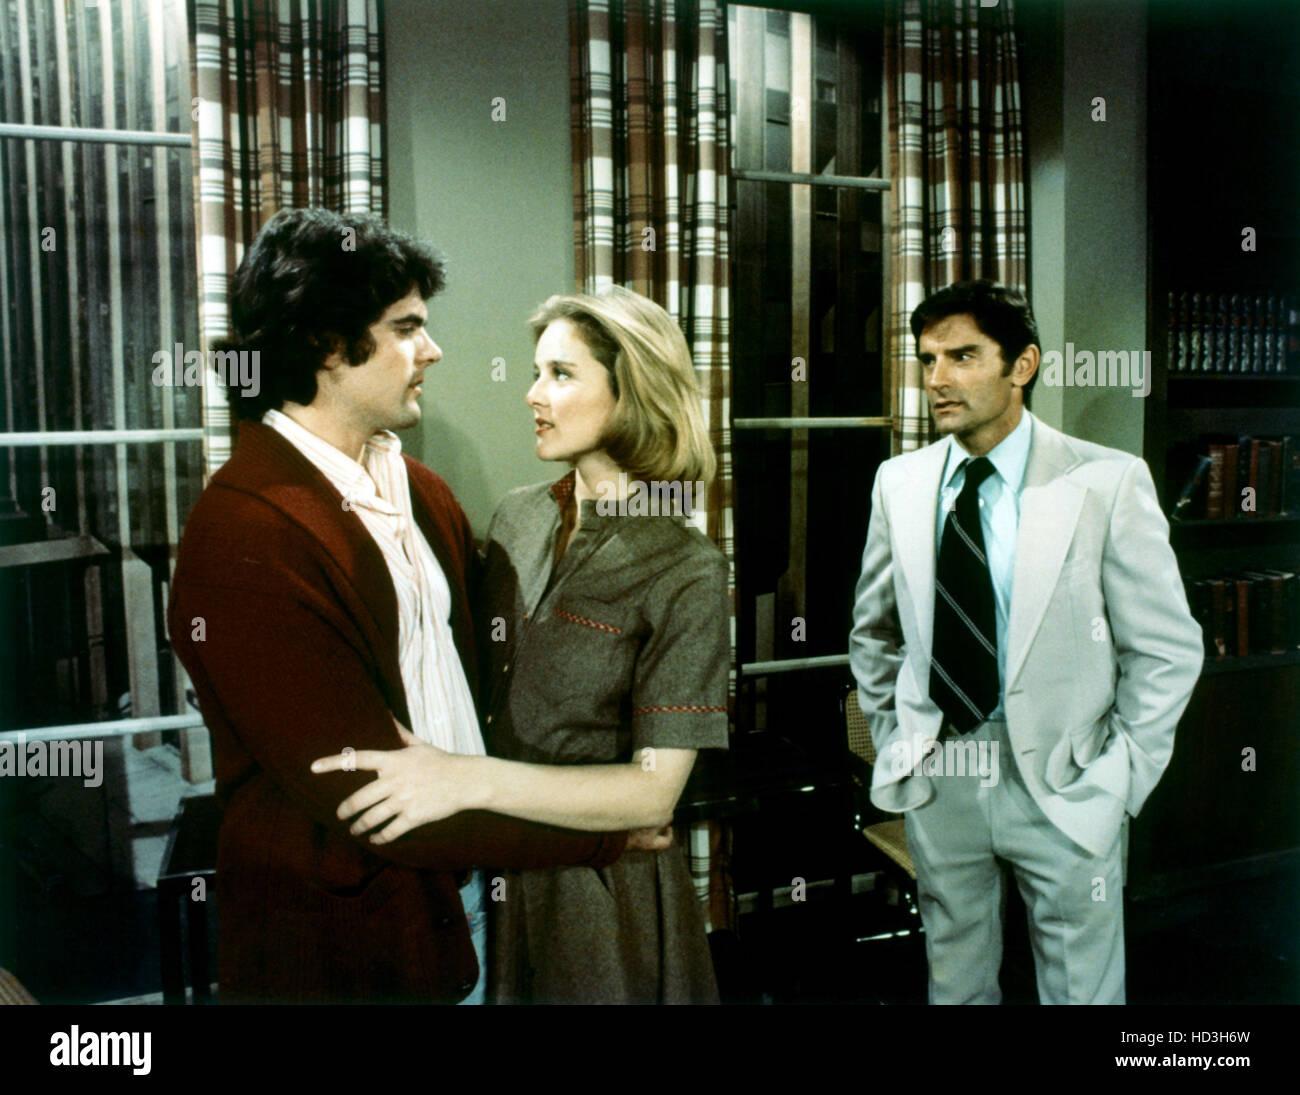 THE GUIDING LIGHT, (from left): Stephen Yates, Robin Mattson, Don Stewart, (ca. mid 1970s), 1952-2009. Stock Photo